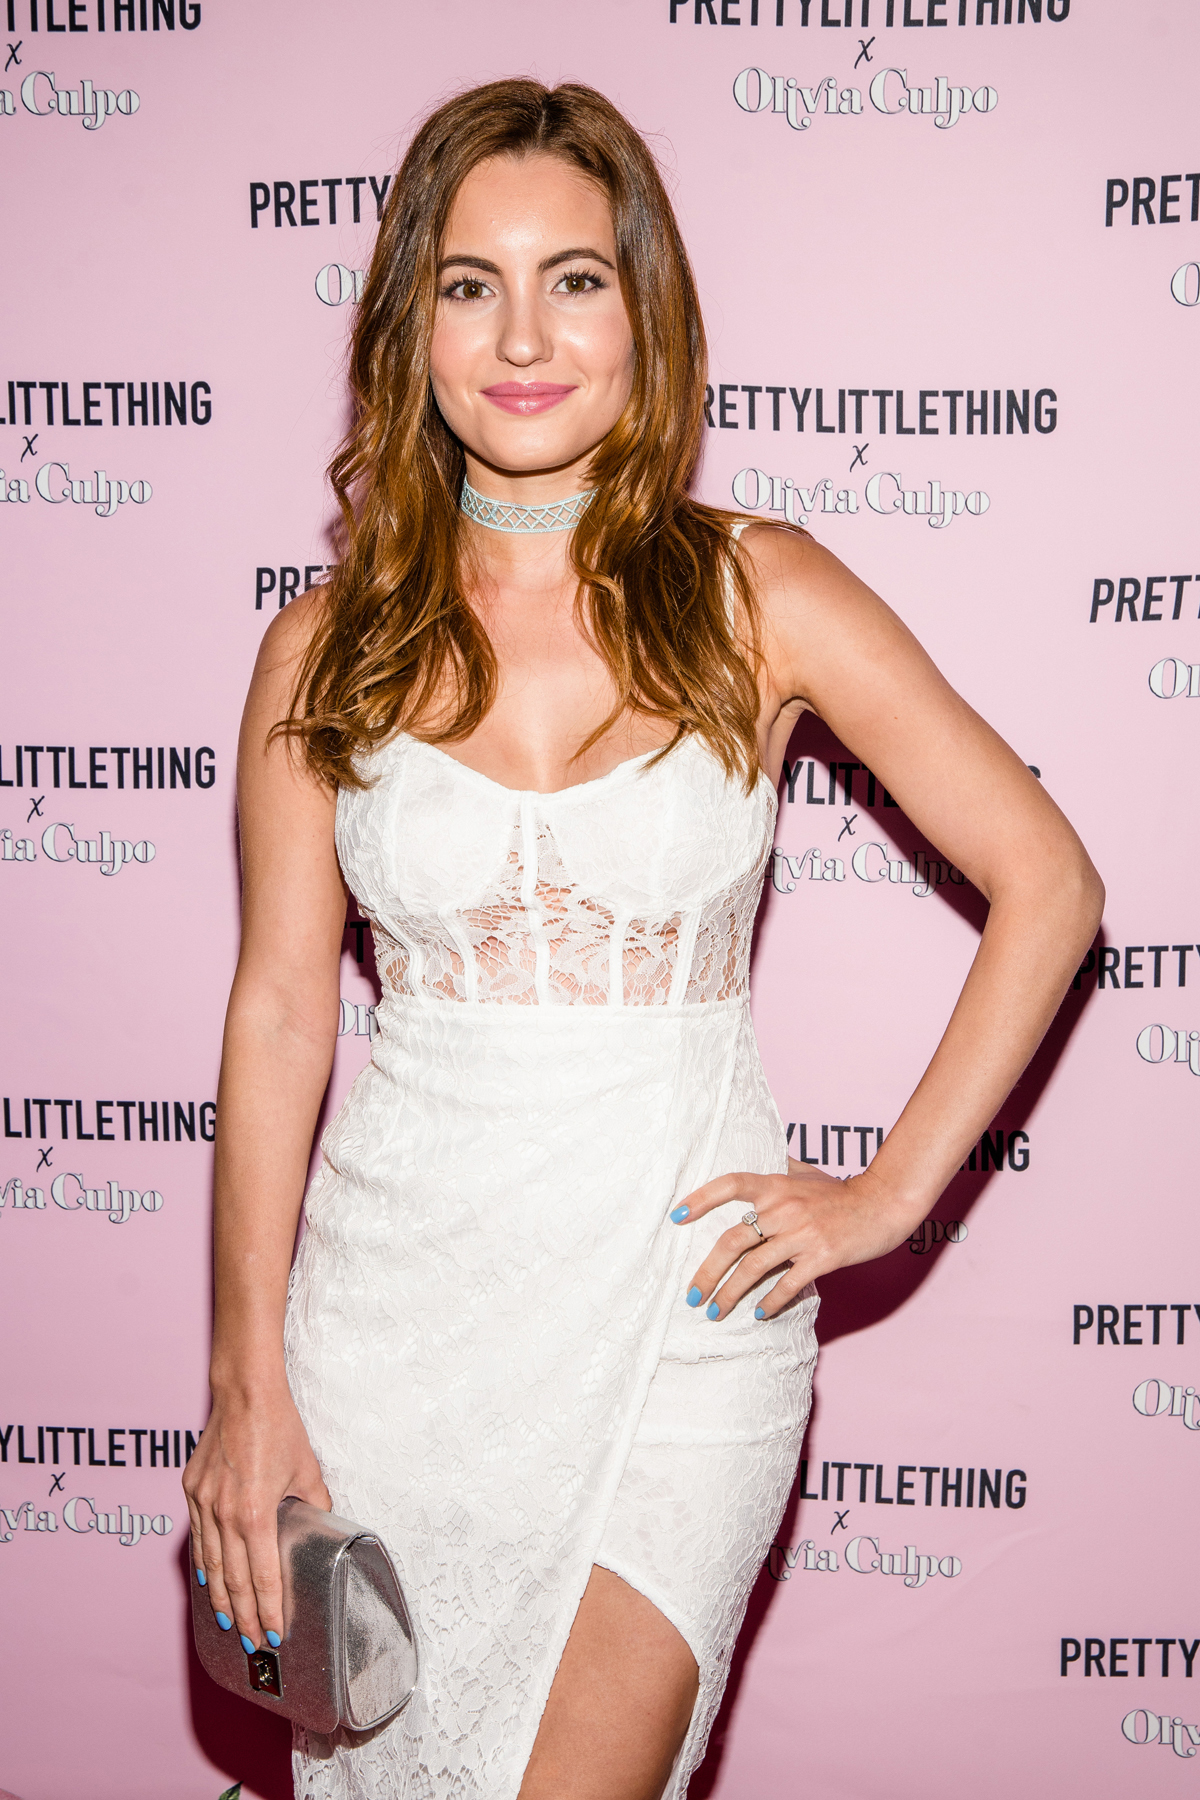 PrettyLittleThing PLT X Olivia Culpo Collection  Celebrity Launch Party Eva  Gutowski.jpg